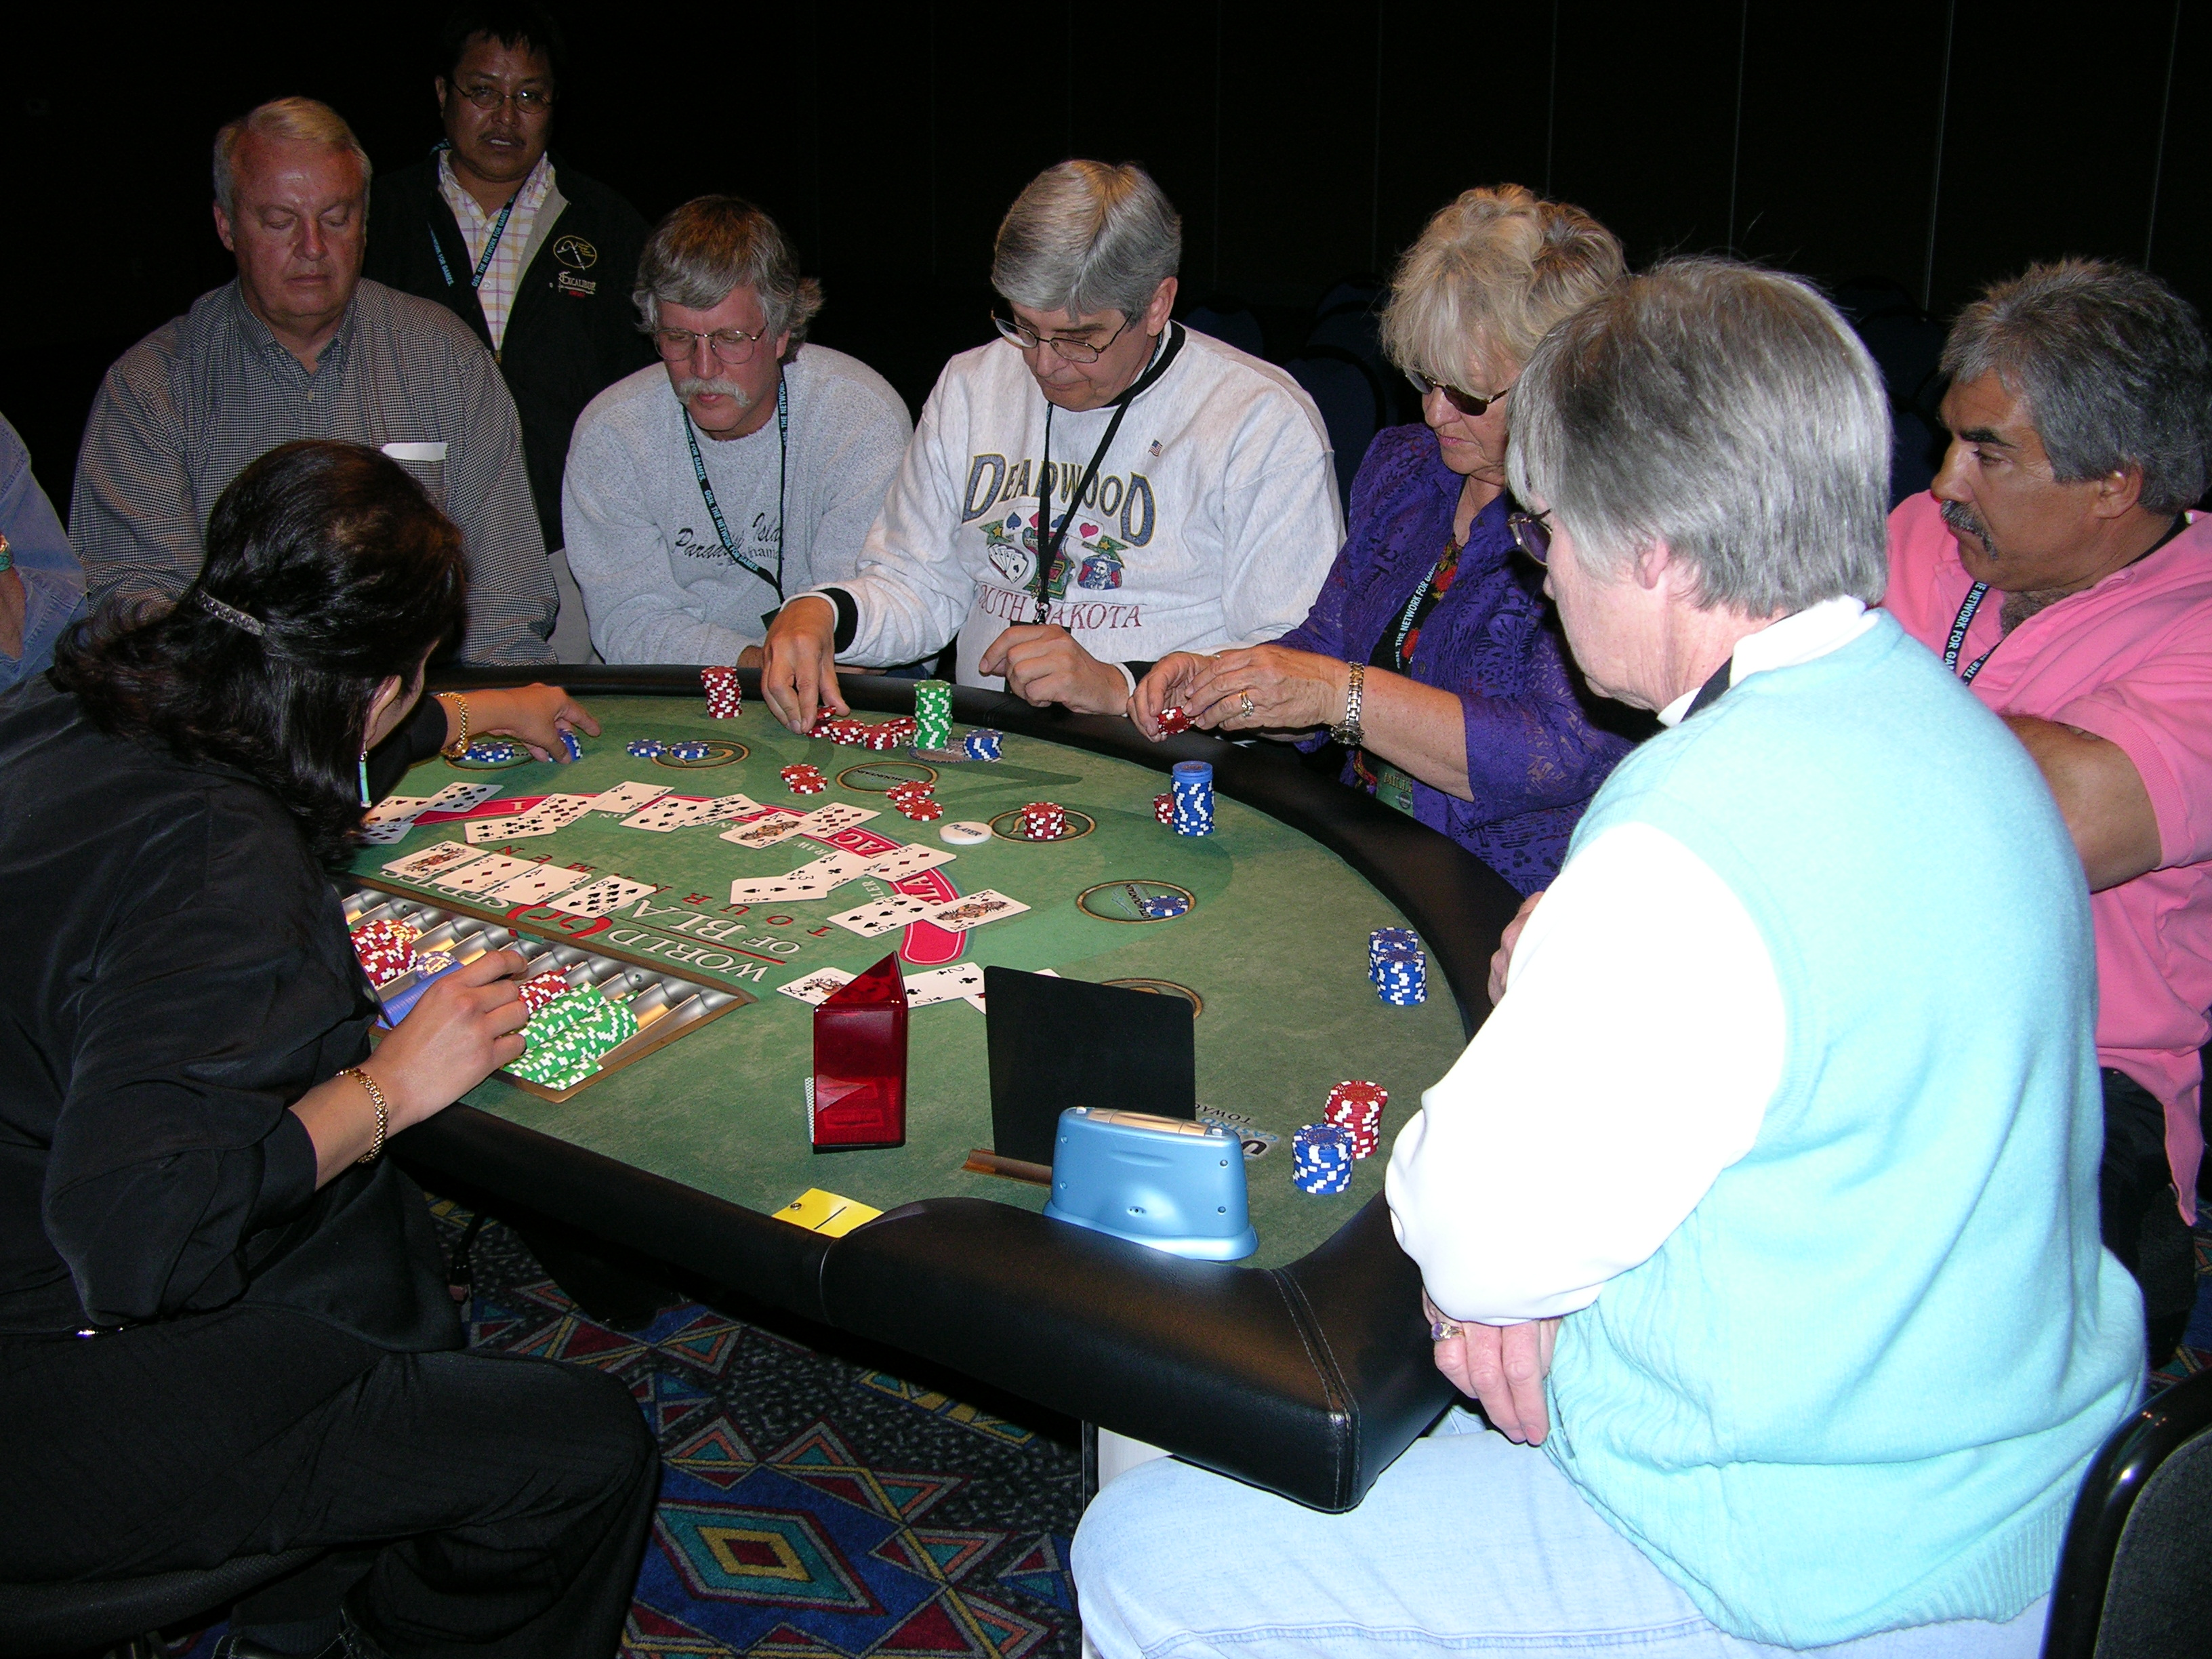 Ute mountain casino poker nuances casino